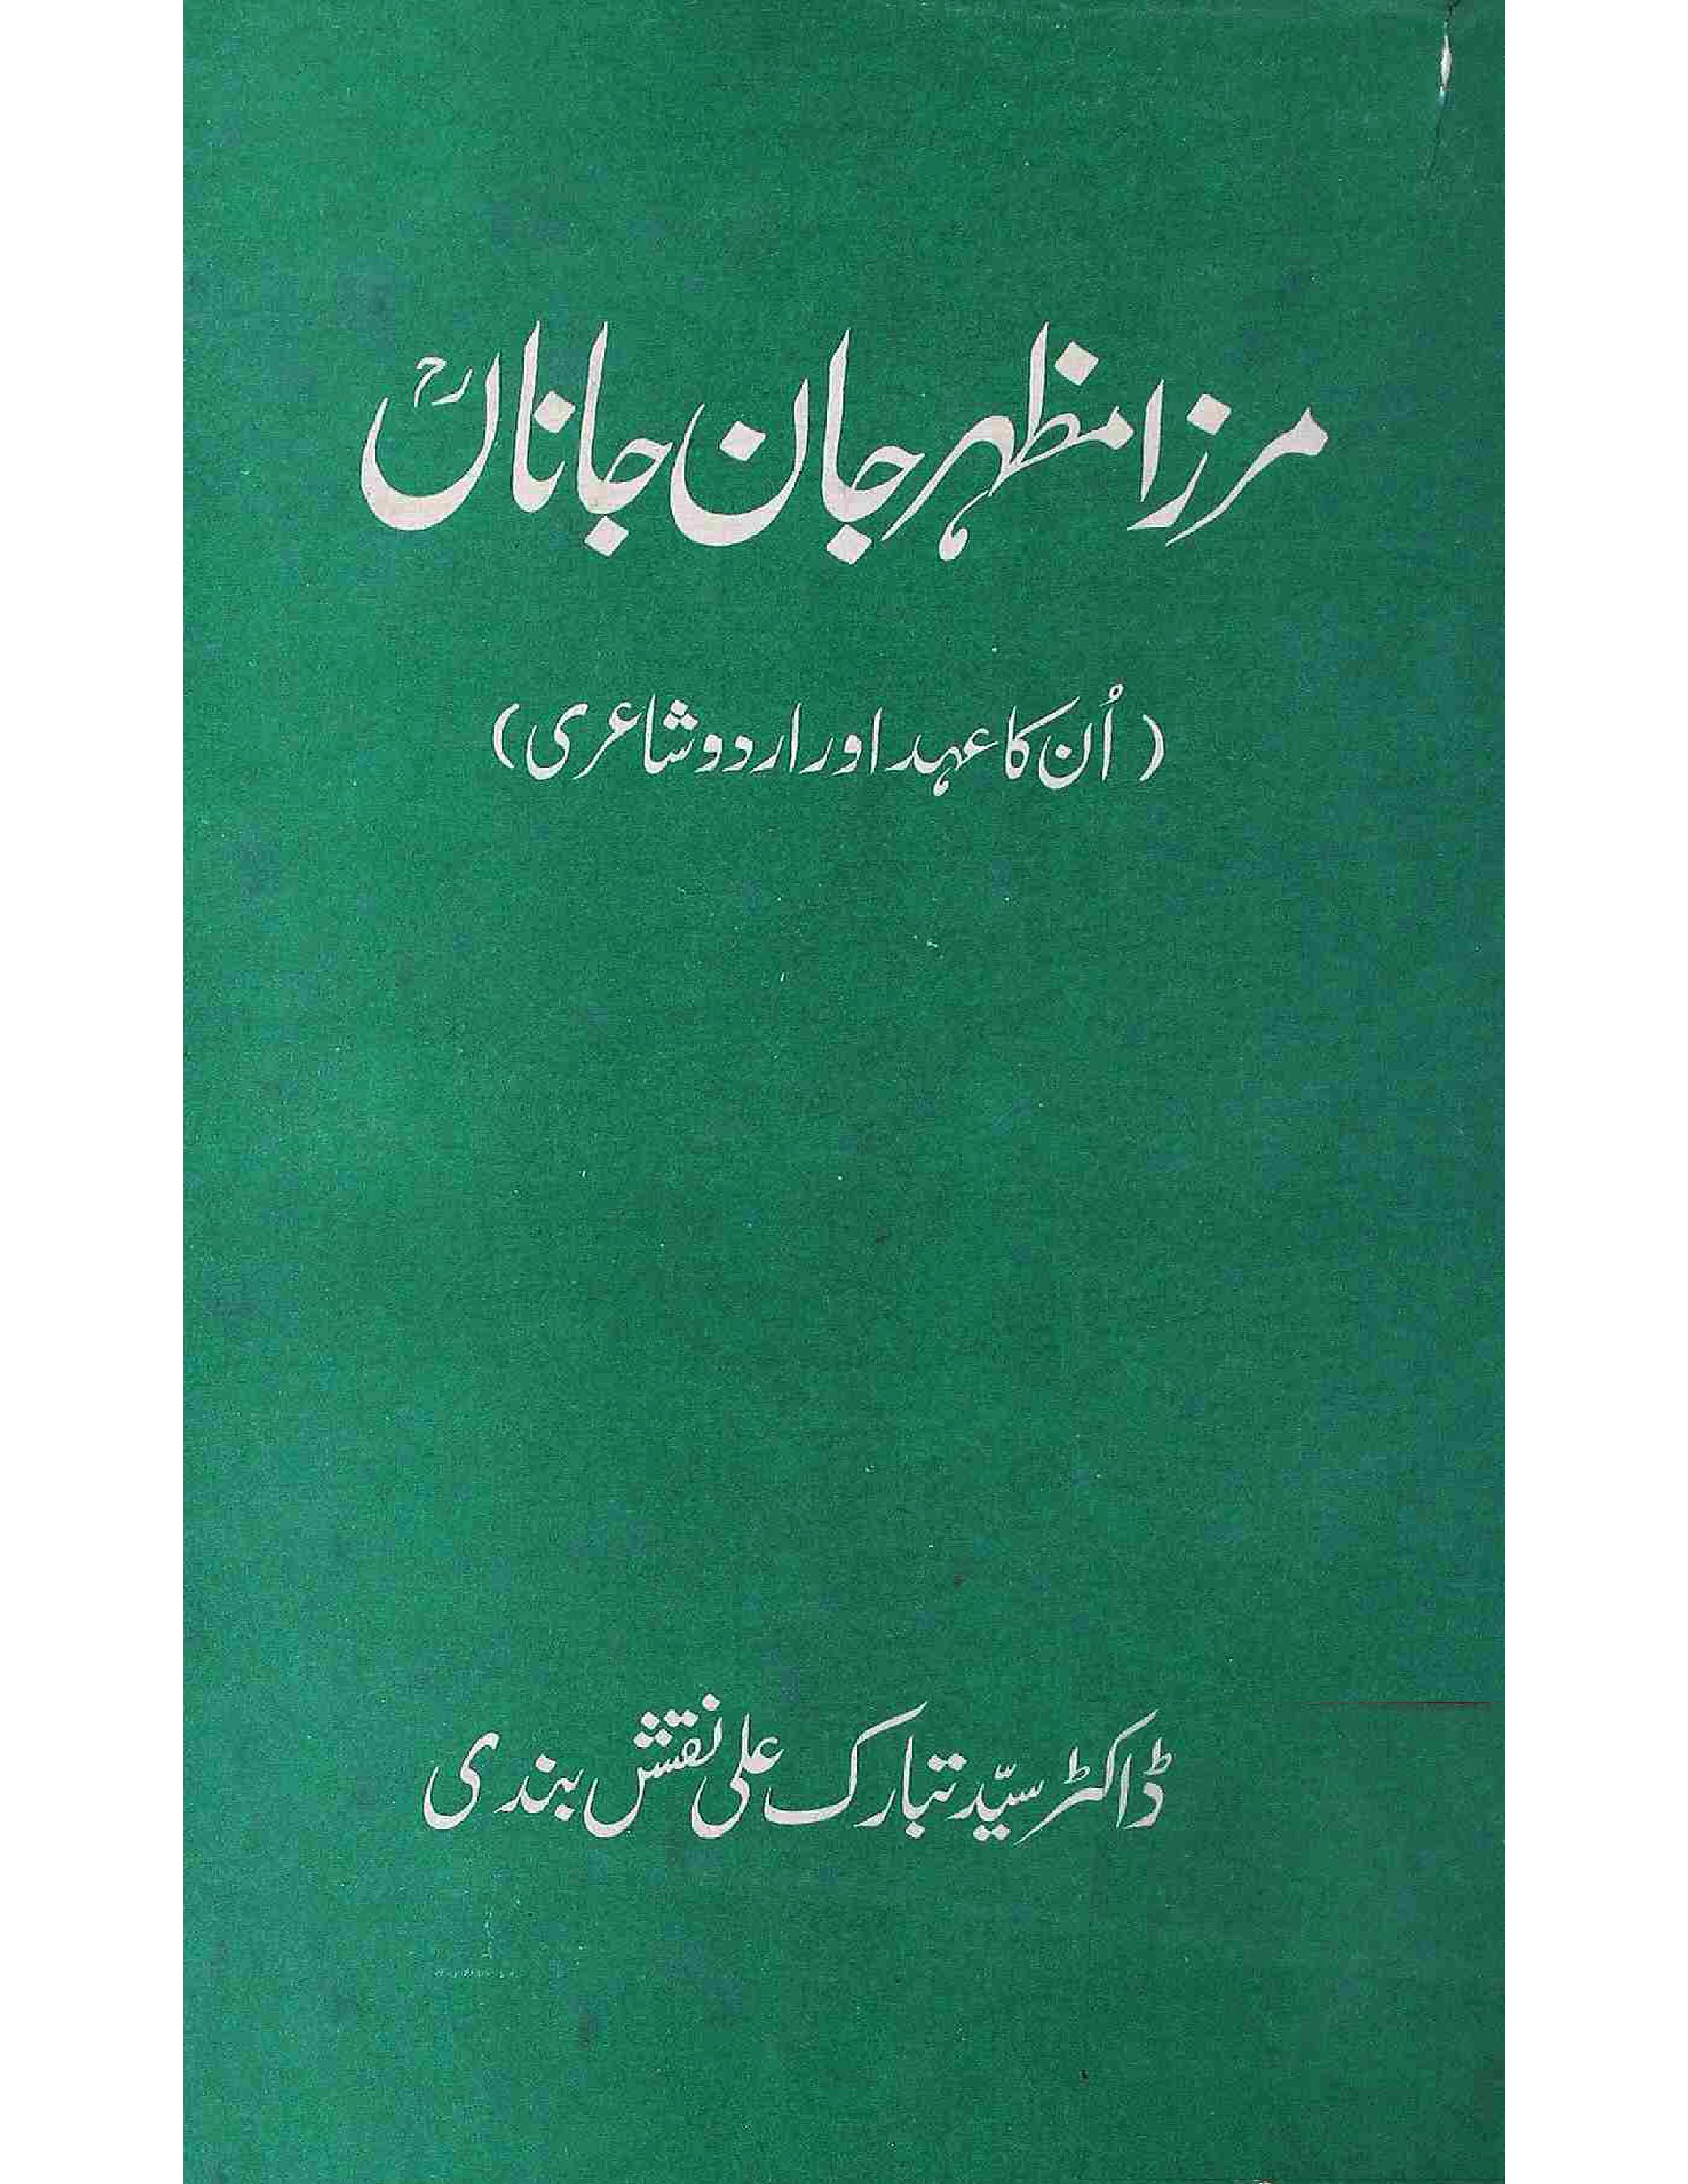 Mirza Mazhar Jaan-e-Janan     Un Ka Ahd Aur Urdu Shairi